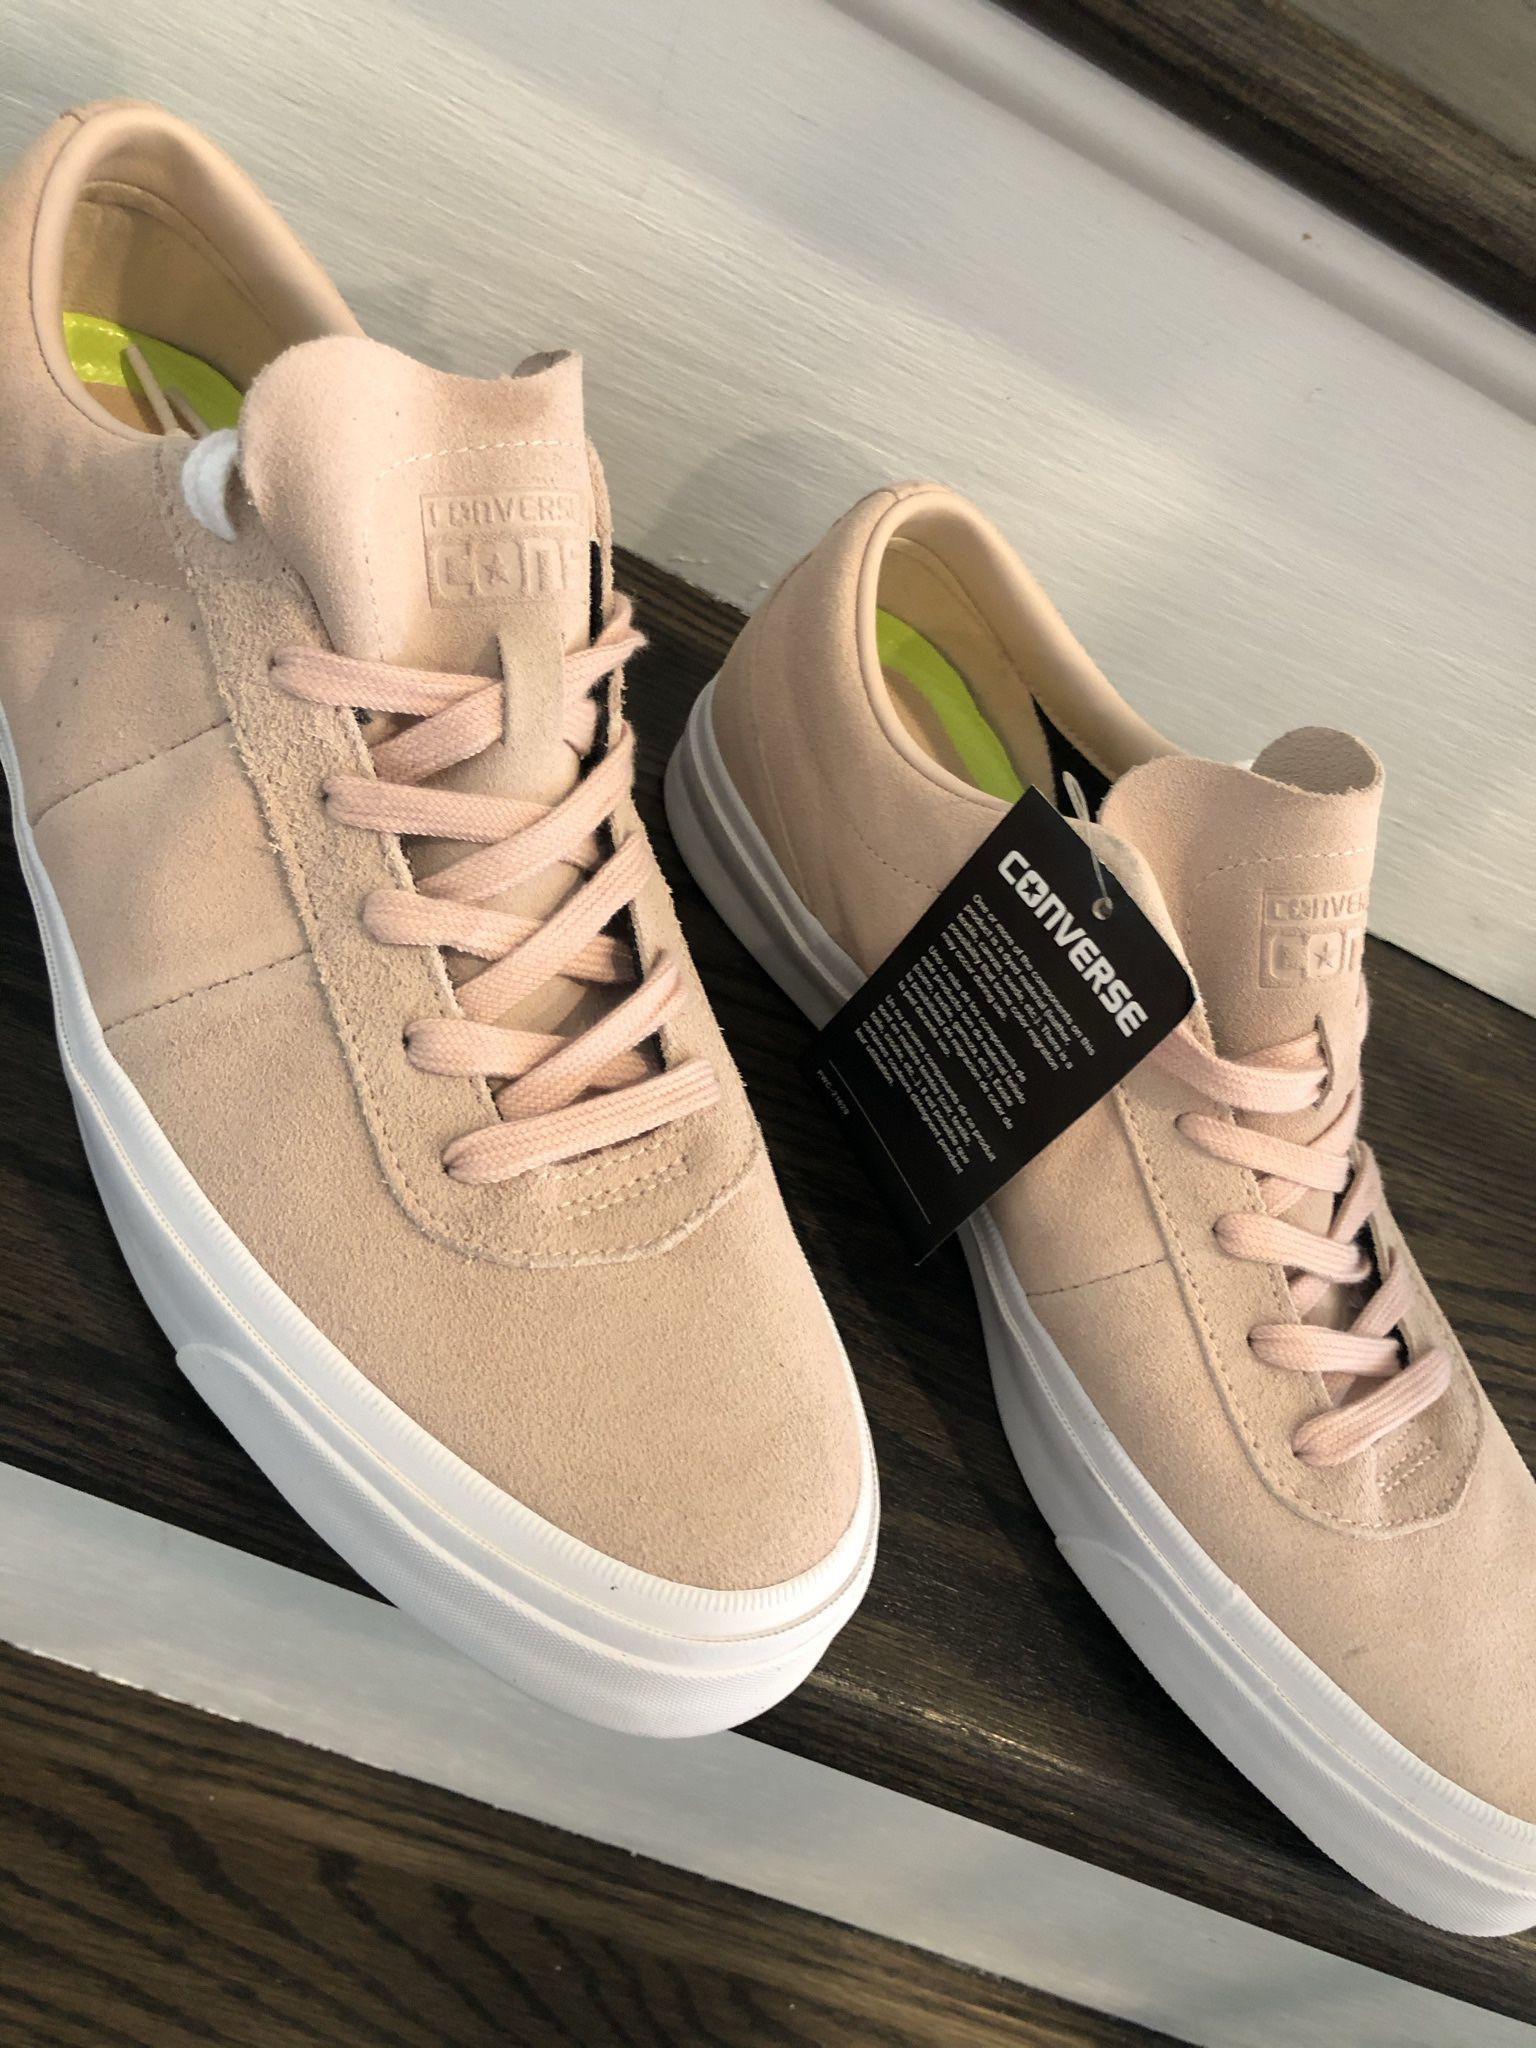 Brand New Chuck Taylors $60 Size 10